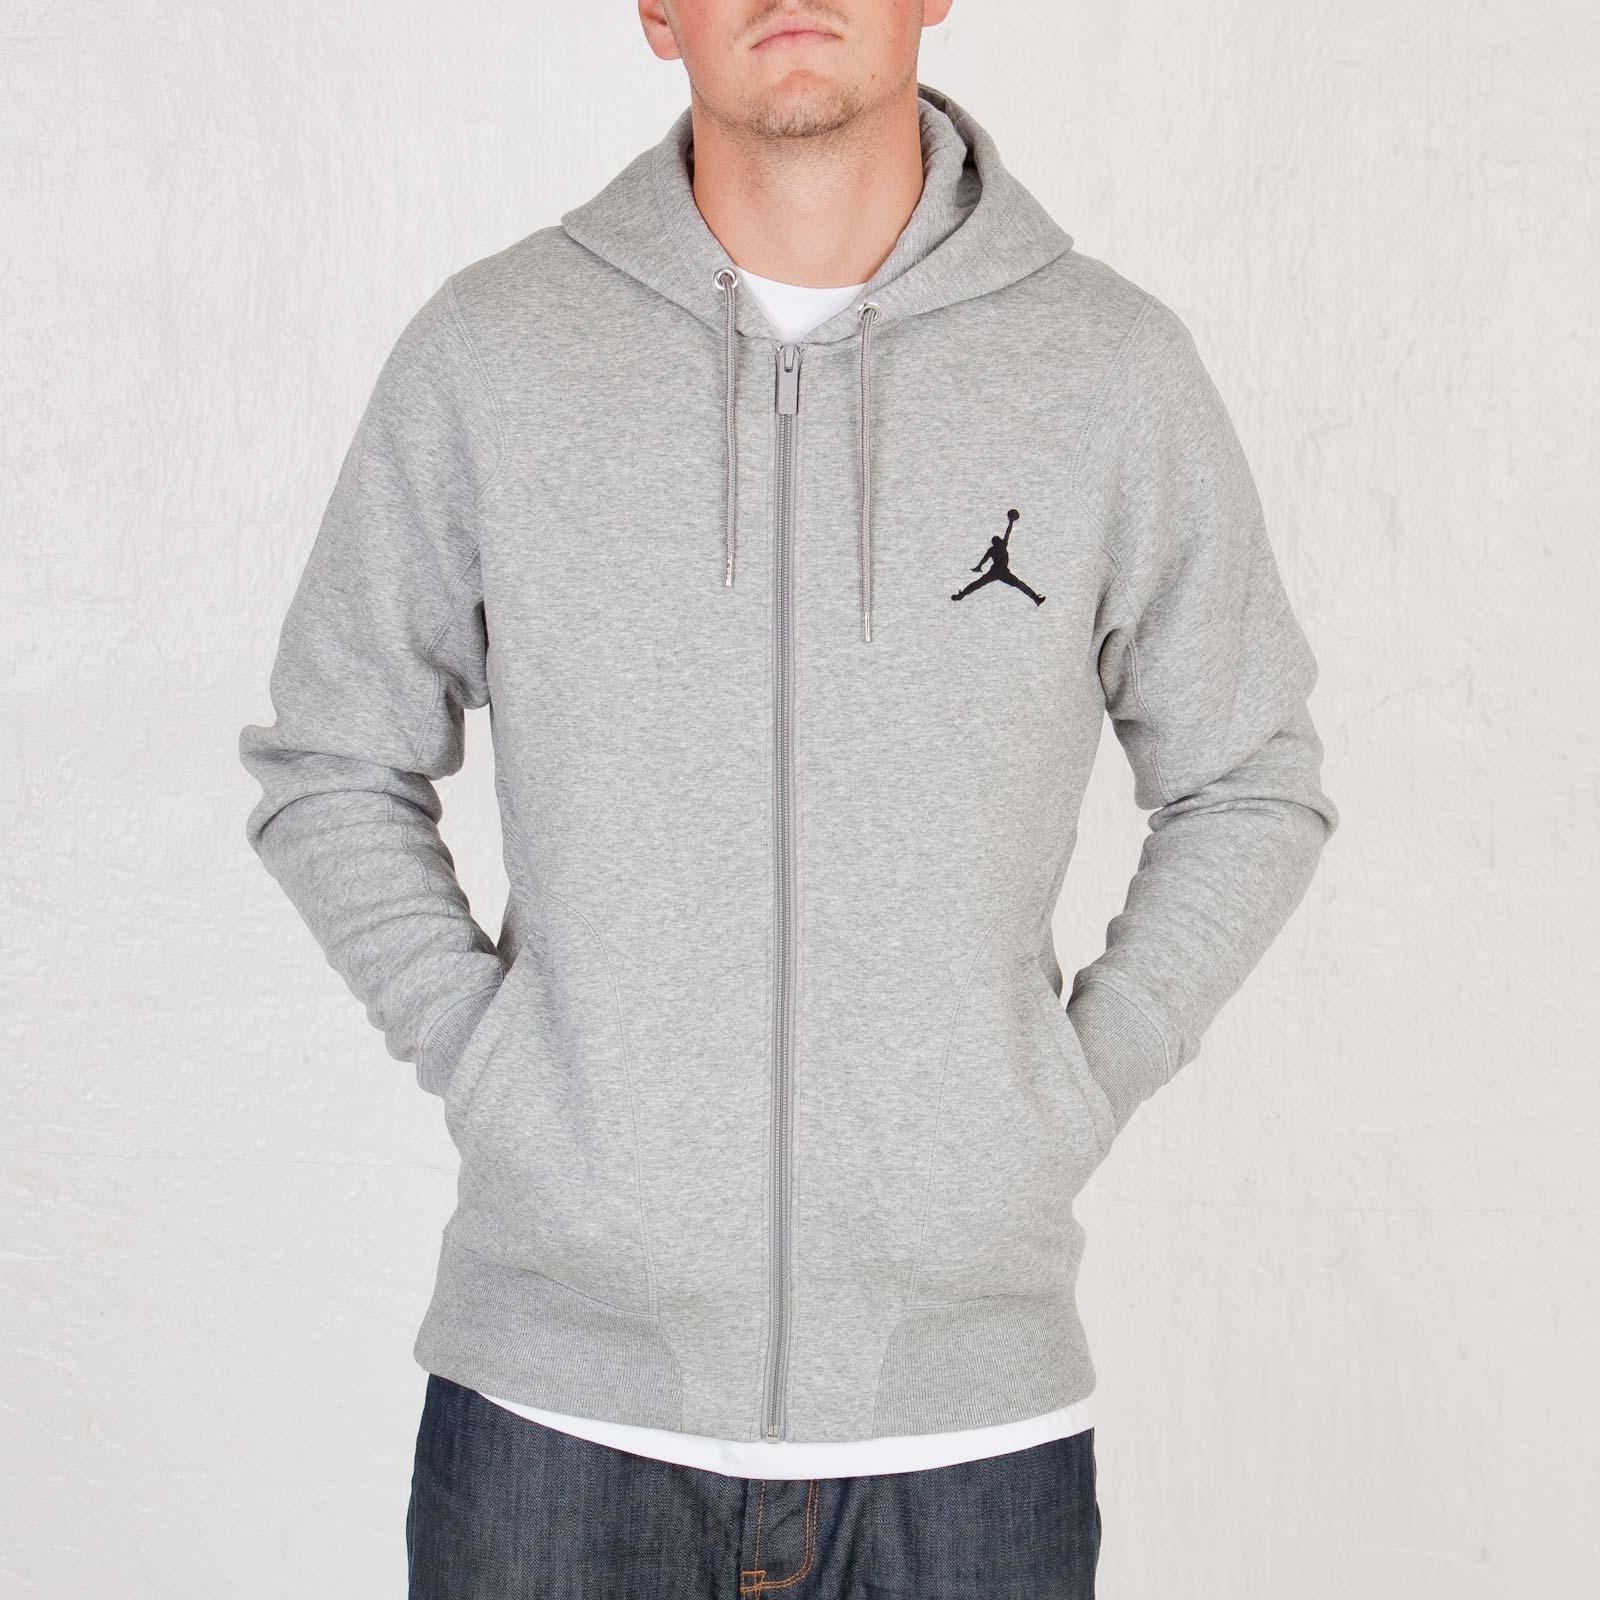 promo code buy popular many styles Jordan Brand 23/7 Full Zip Hoody - 547664-063 ...